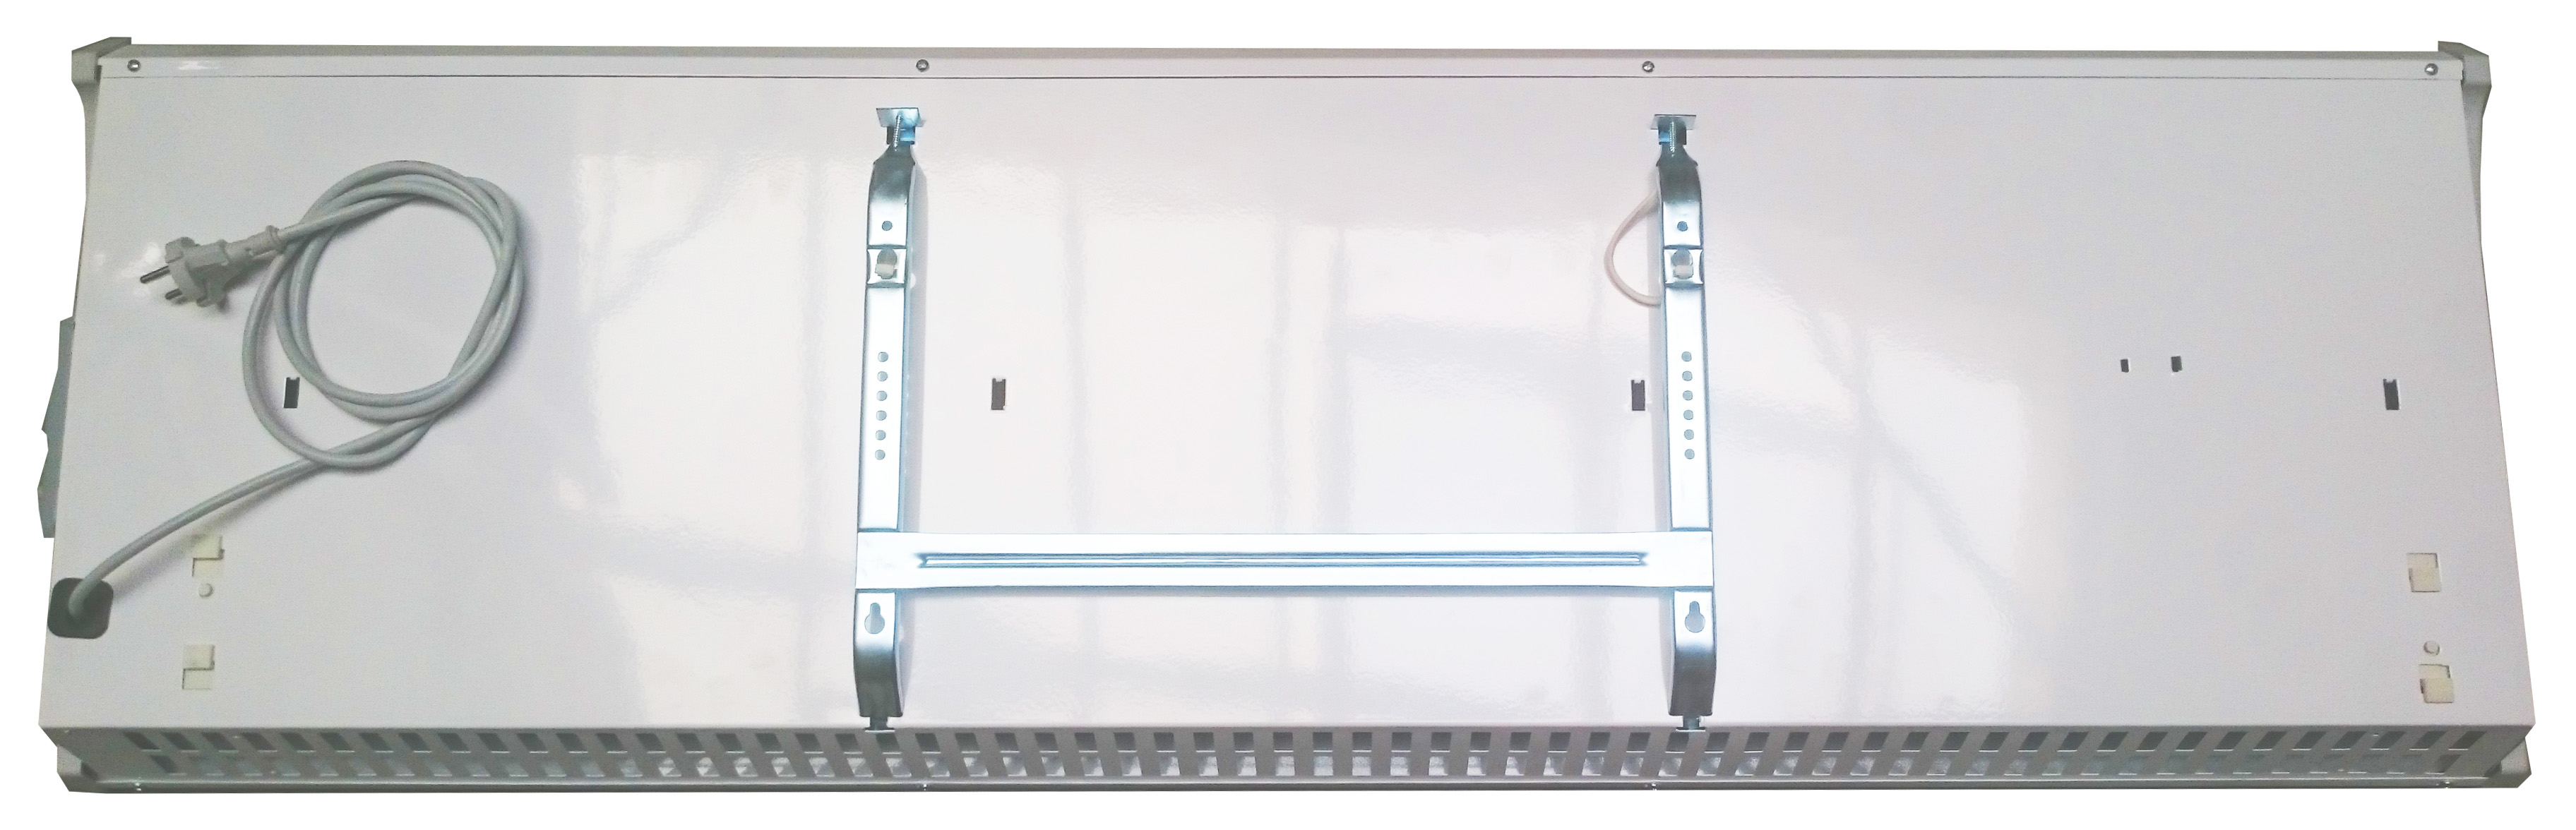 elektro heizkoerper heizung 2000 watt heizk rper wand komplett ko ebay. Black Bedroom Furniture Sets. Home Design Ideas